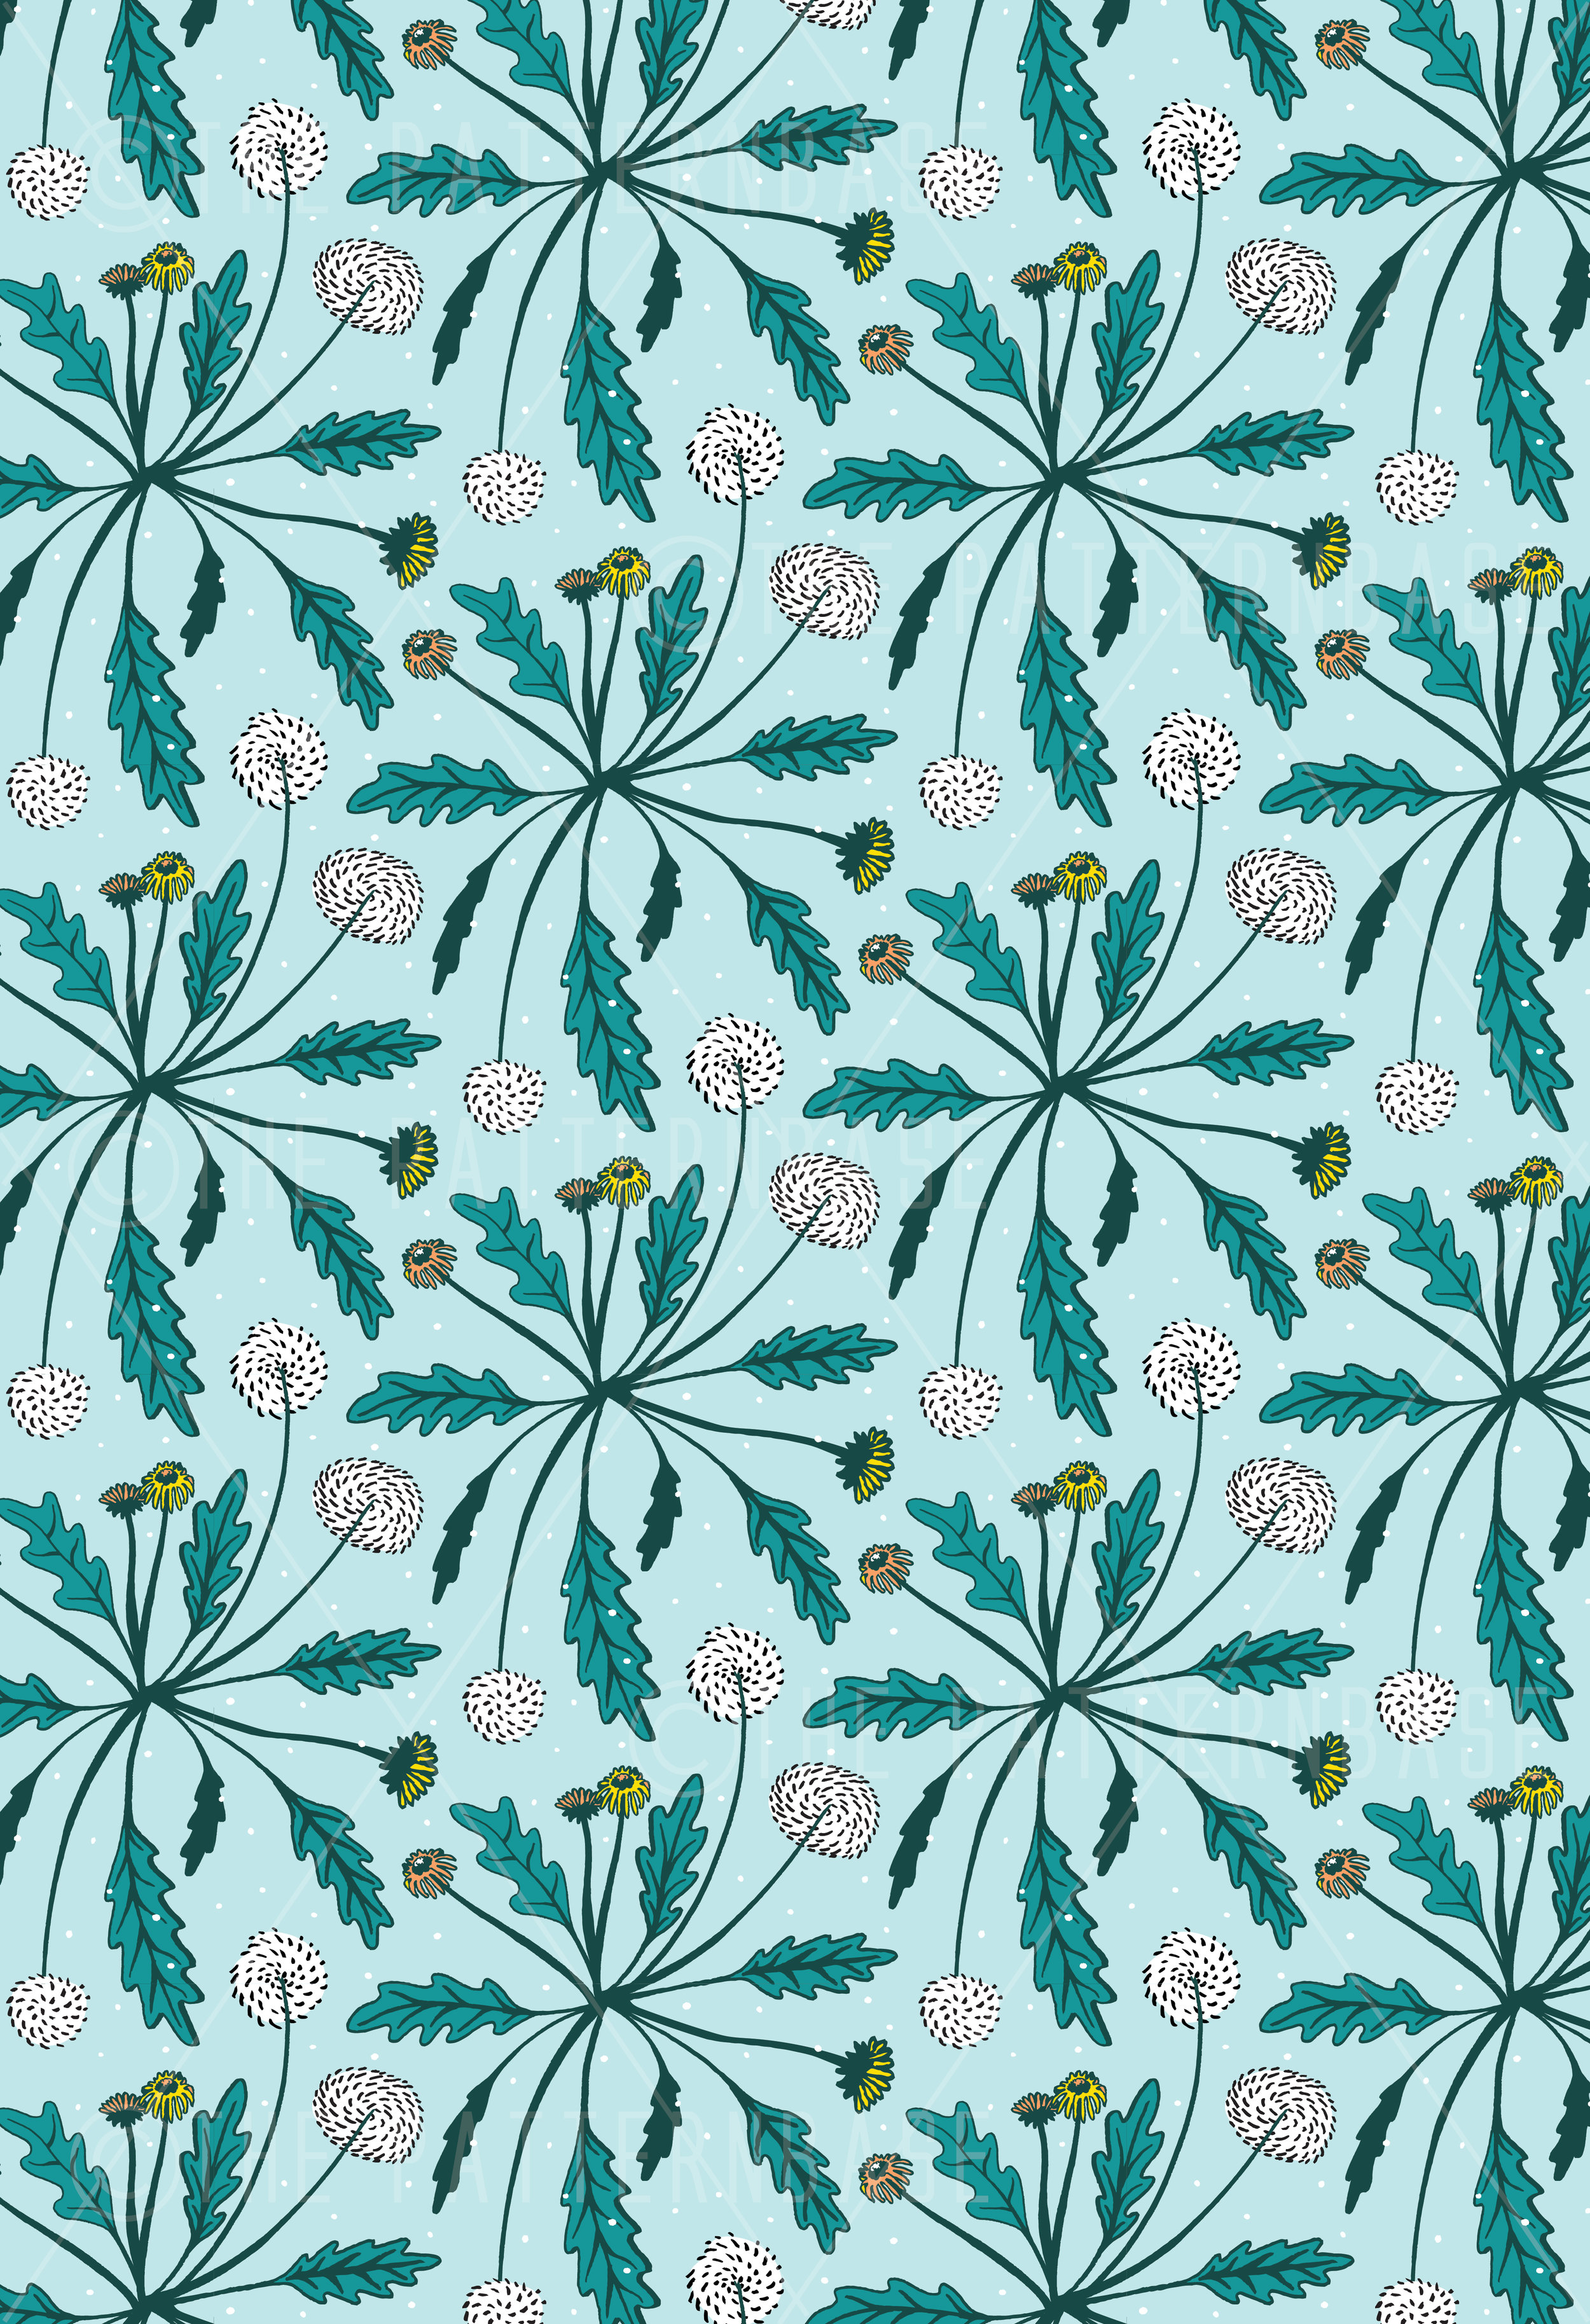 patternbase-puff-blue-wm.jpg